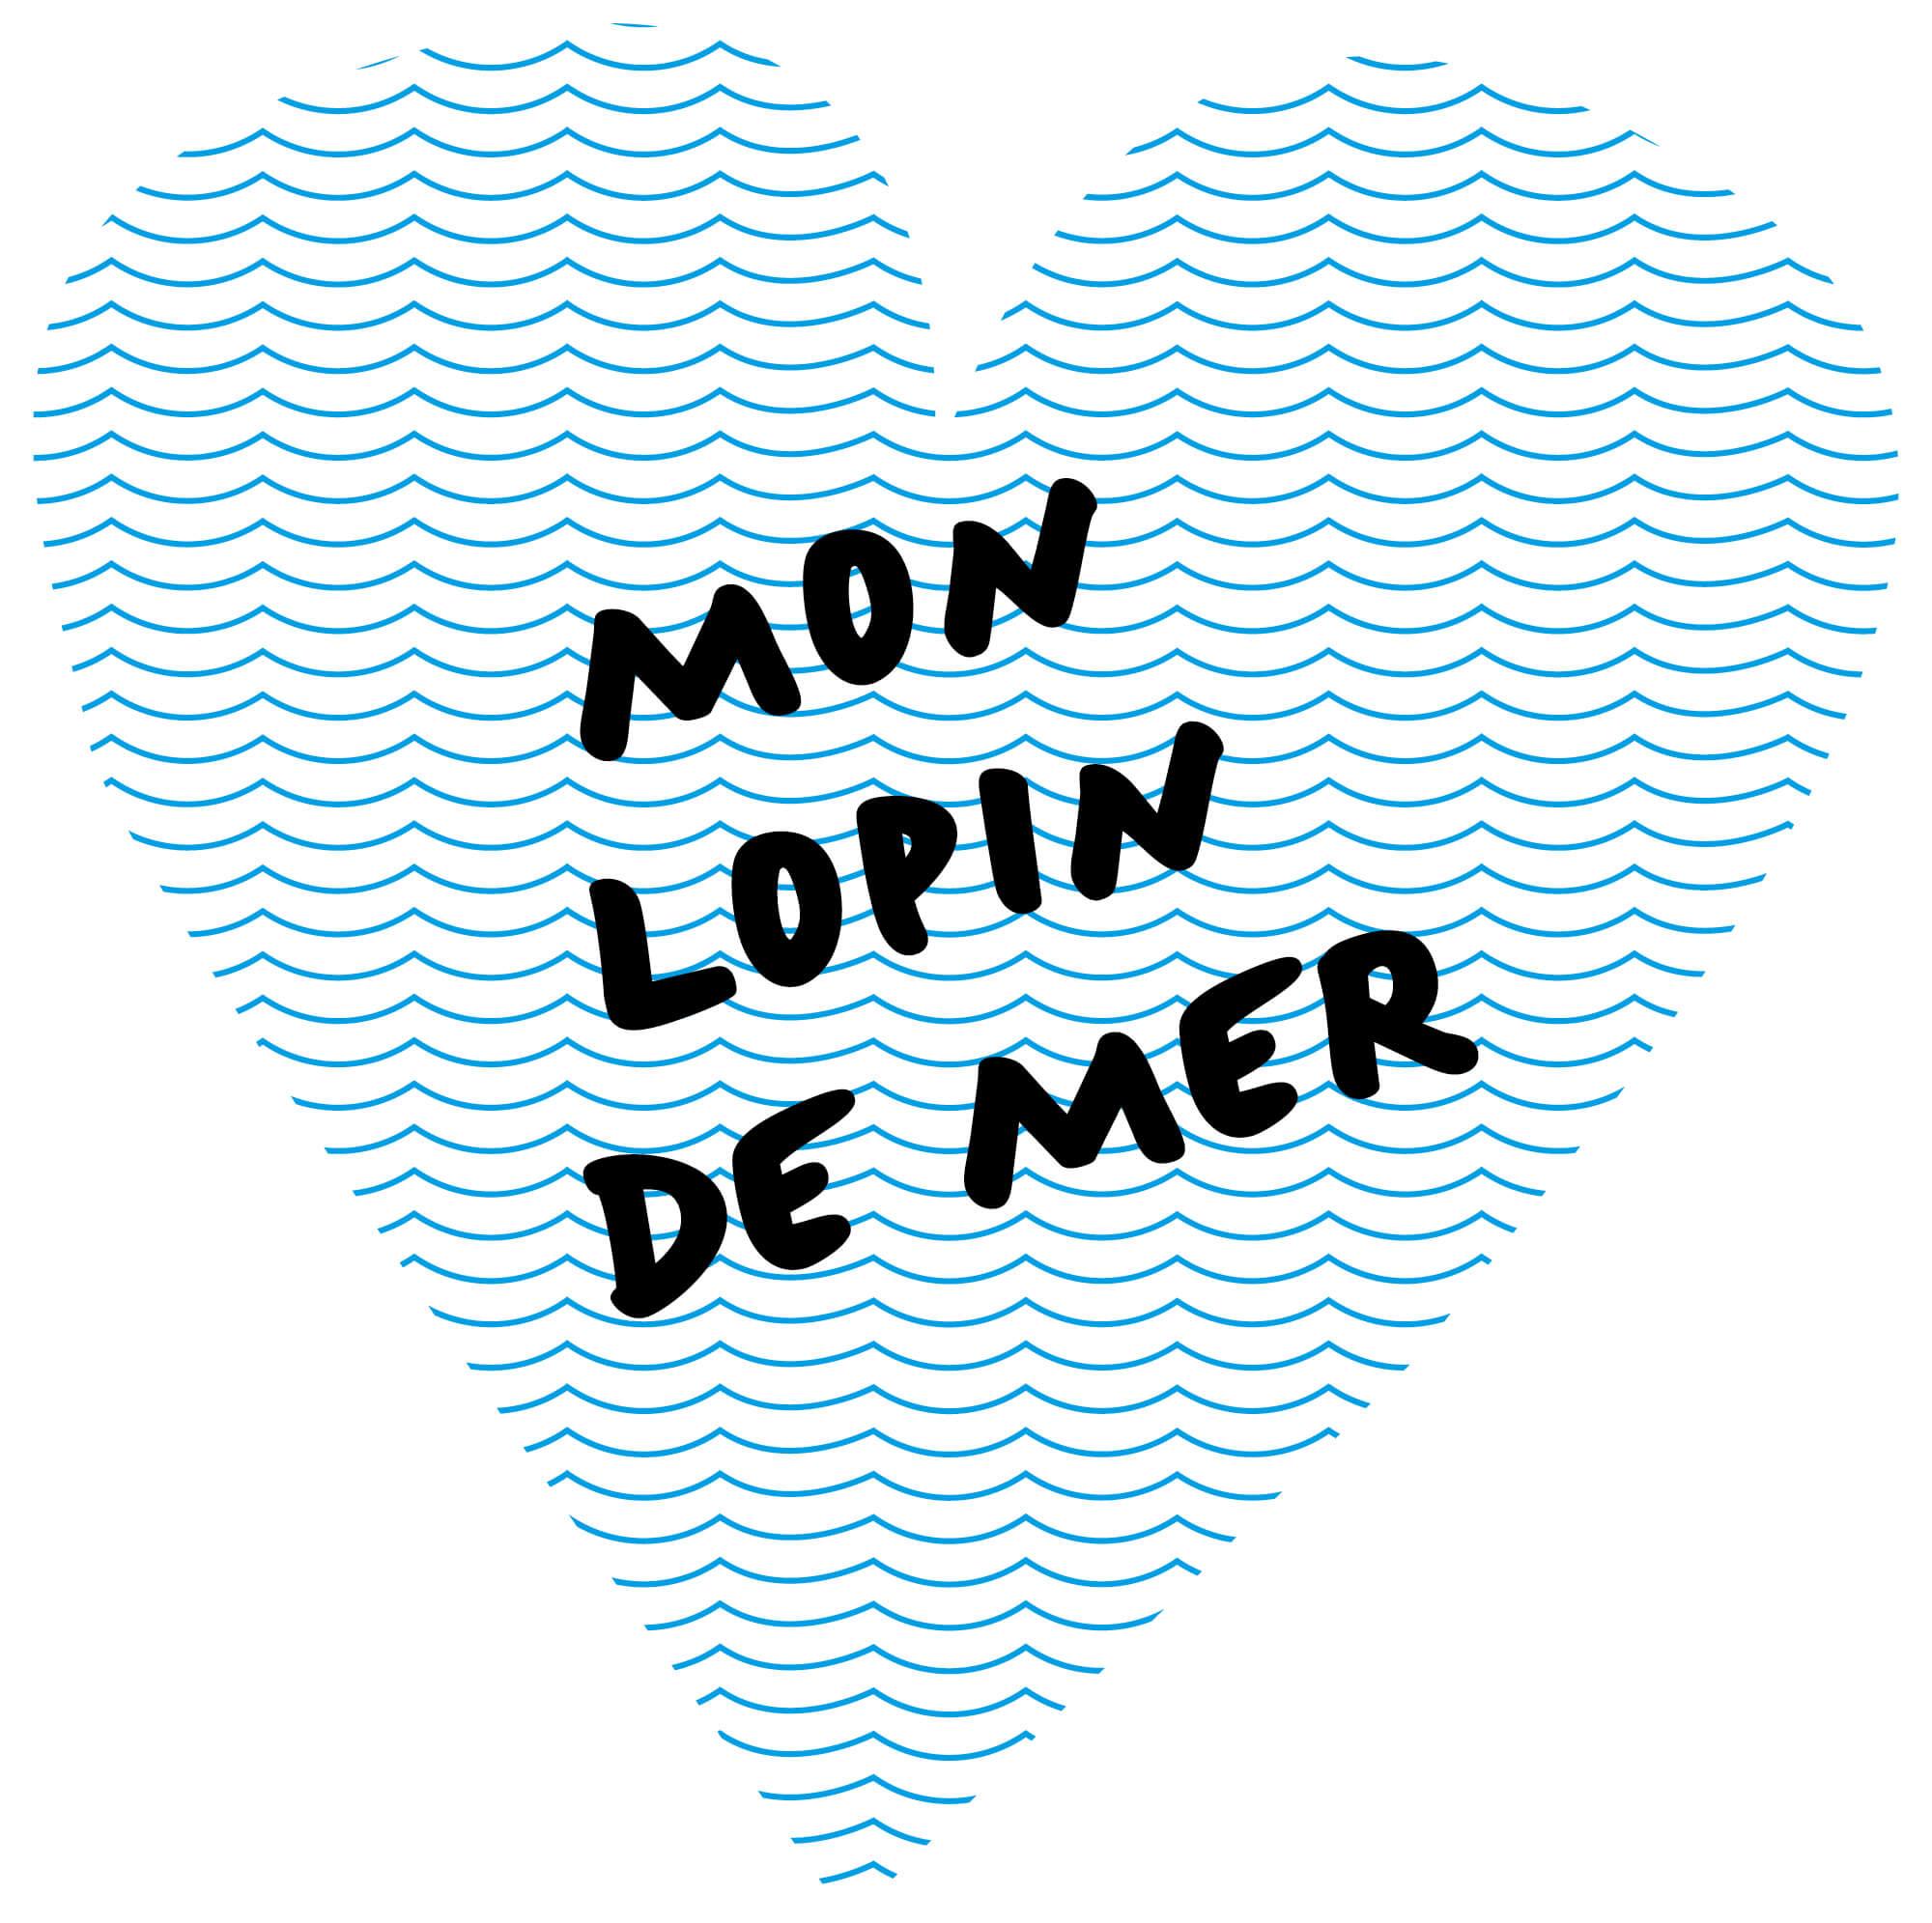 Logo de l'poperation mon lopin de mer, un coeur de vague design IchetKar